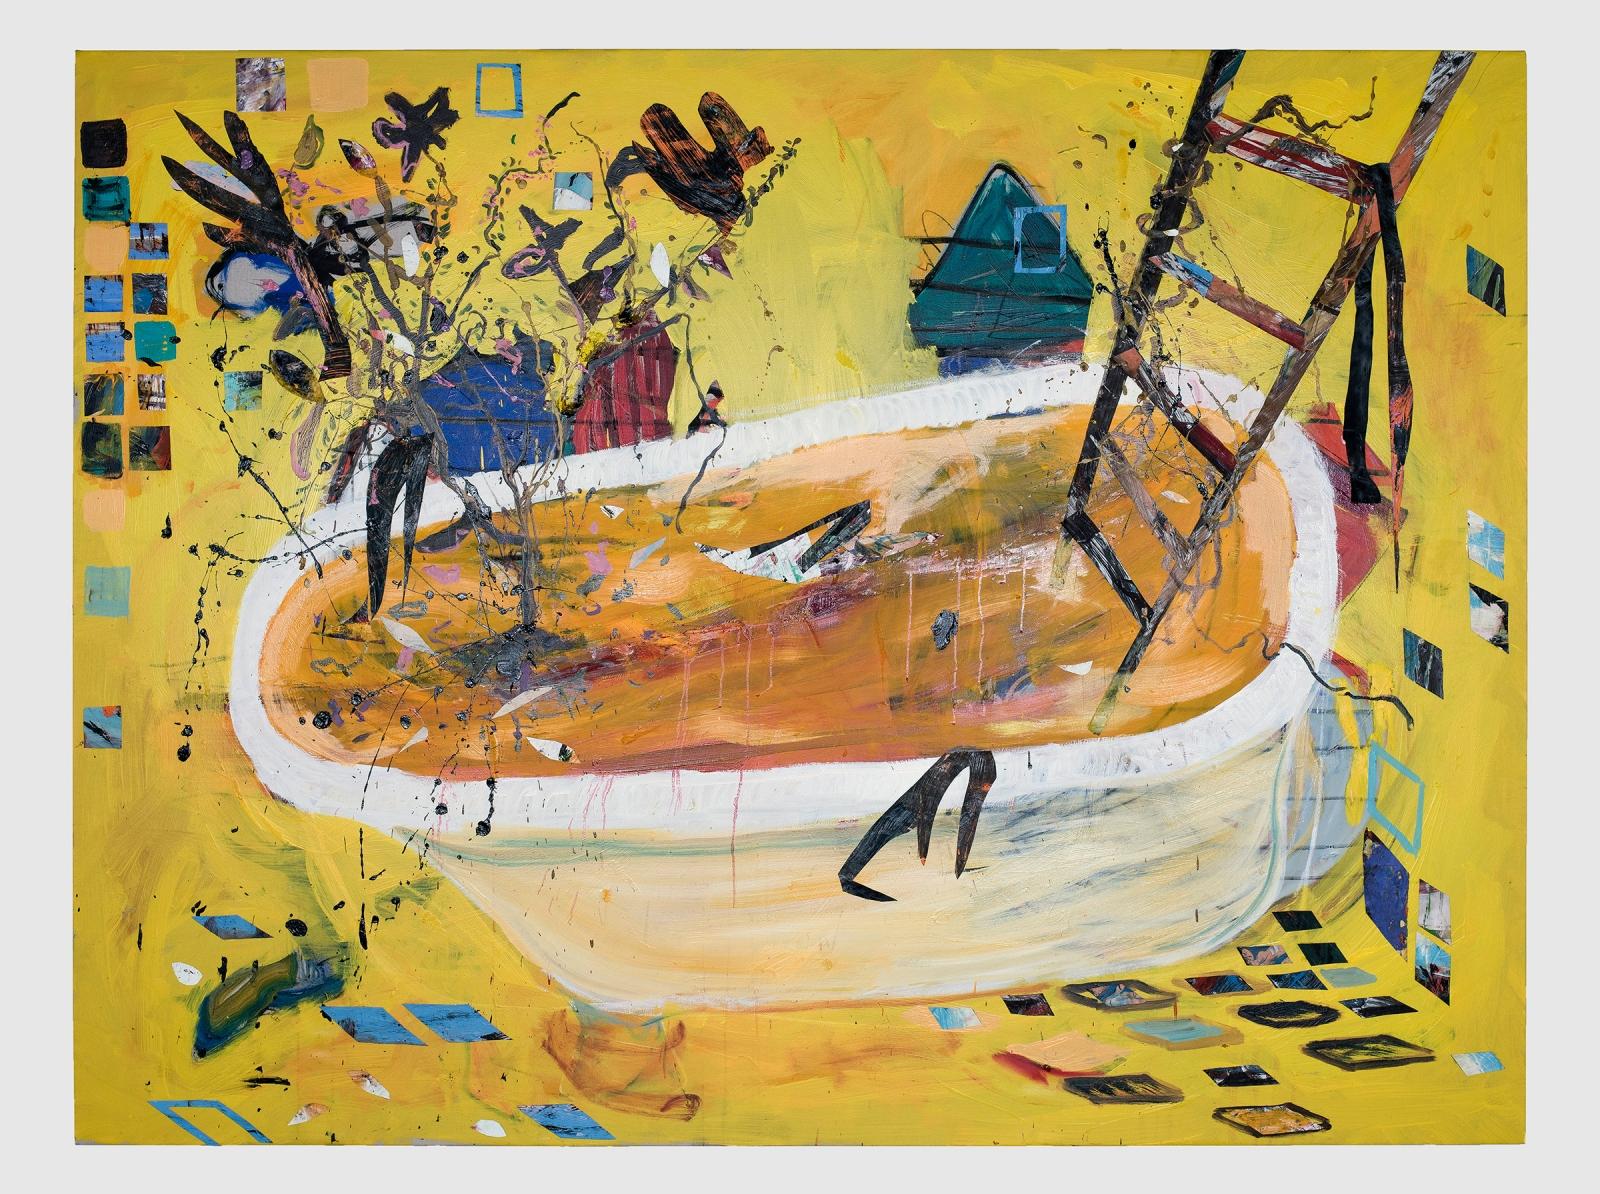 ANGEL OTERO, Painter's Bath, 2020